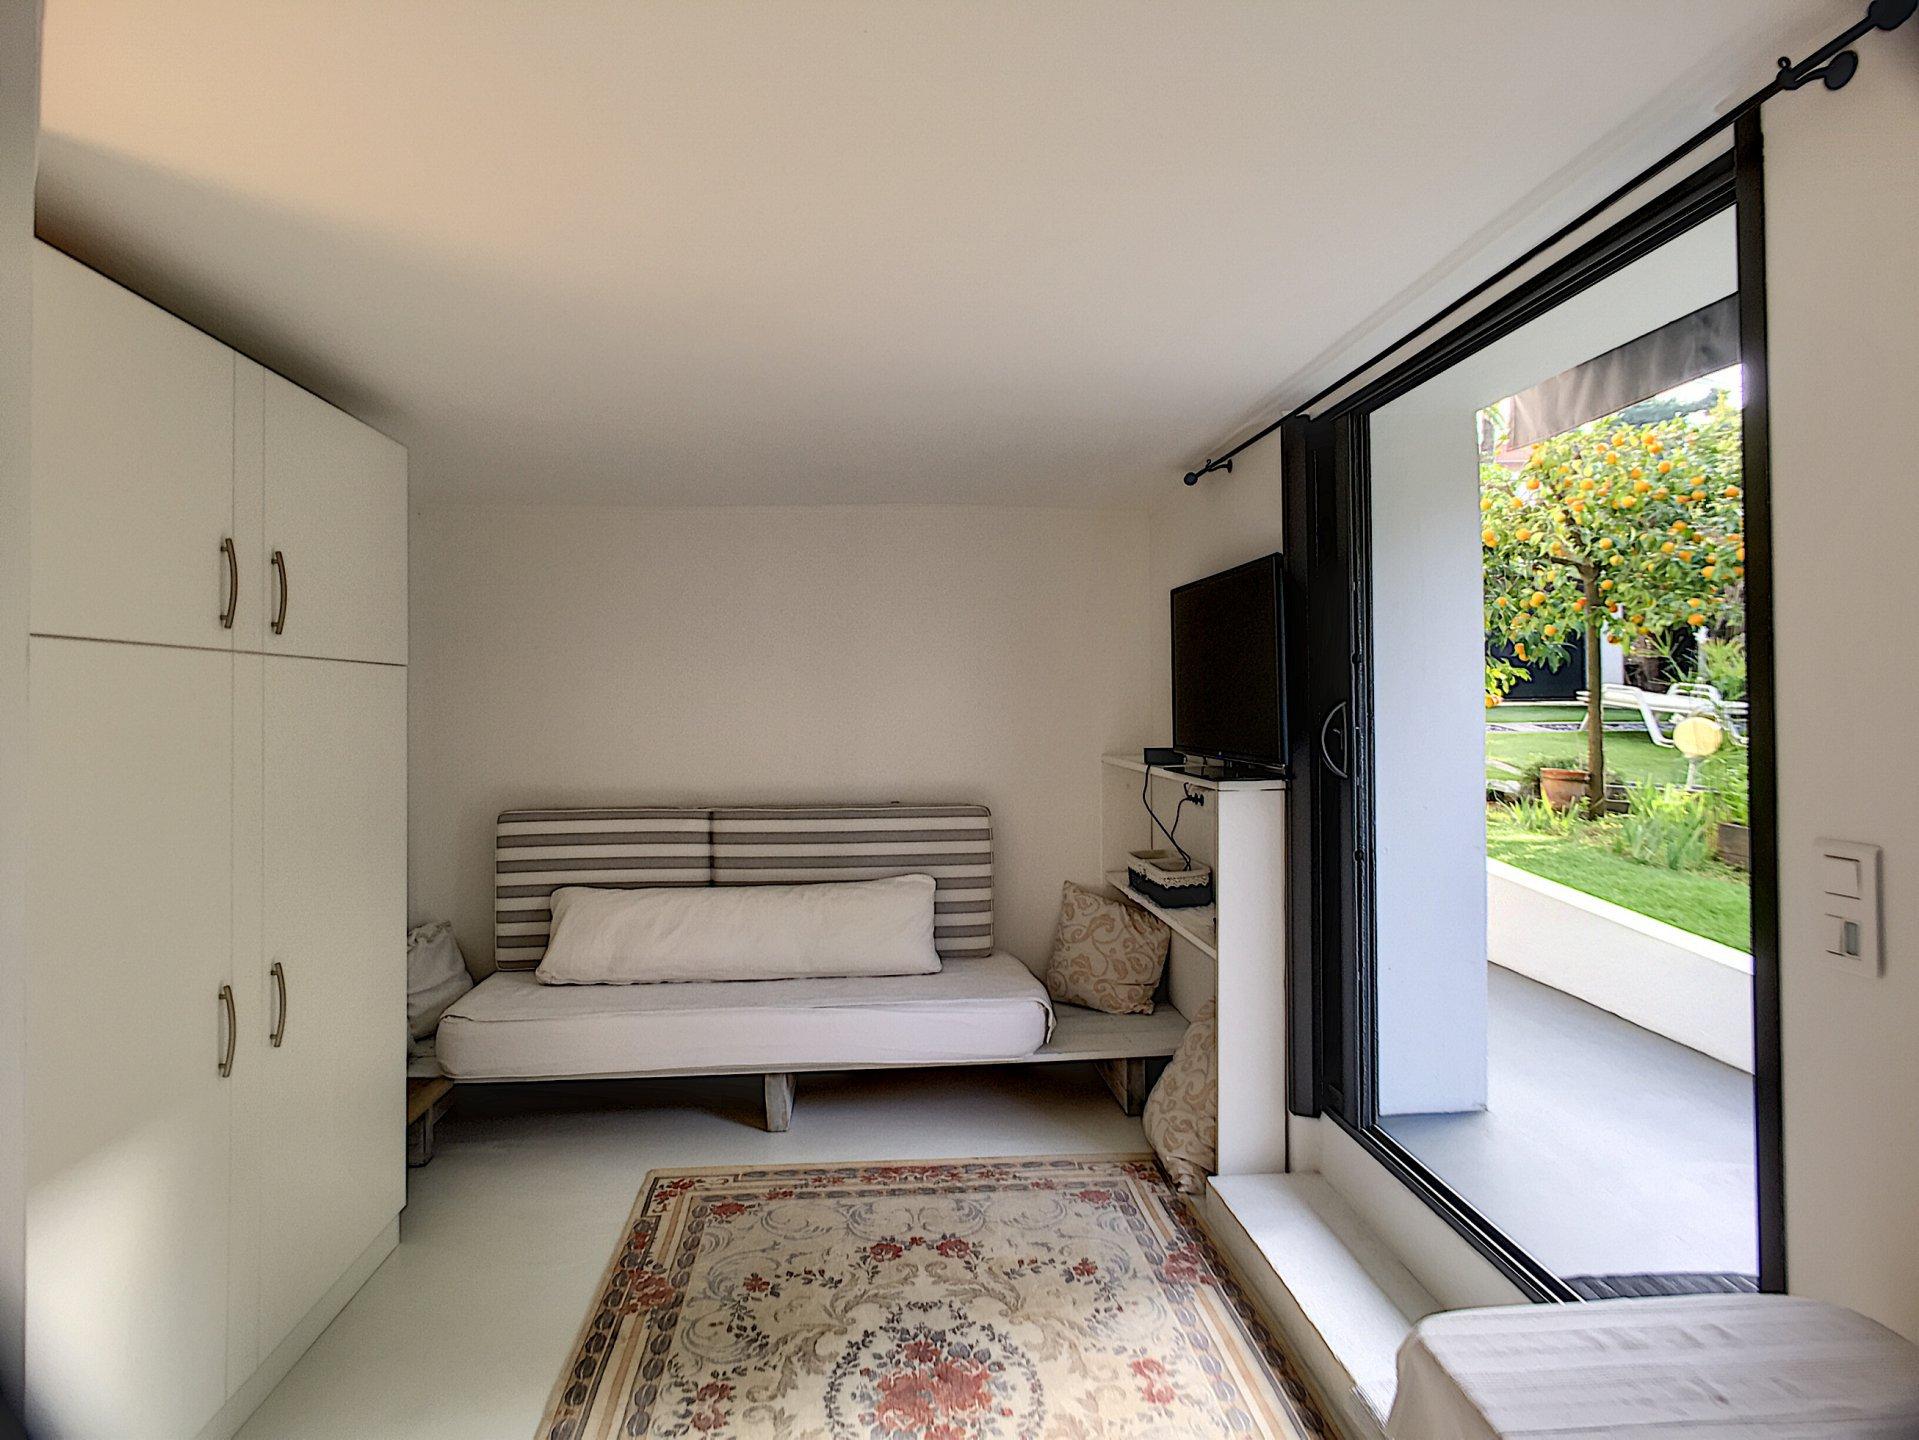 Villa nära havet - Cannes